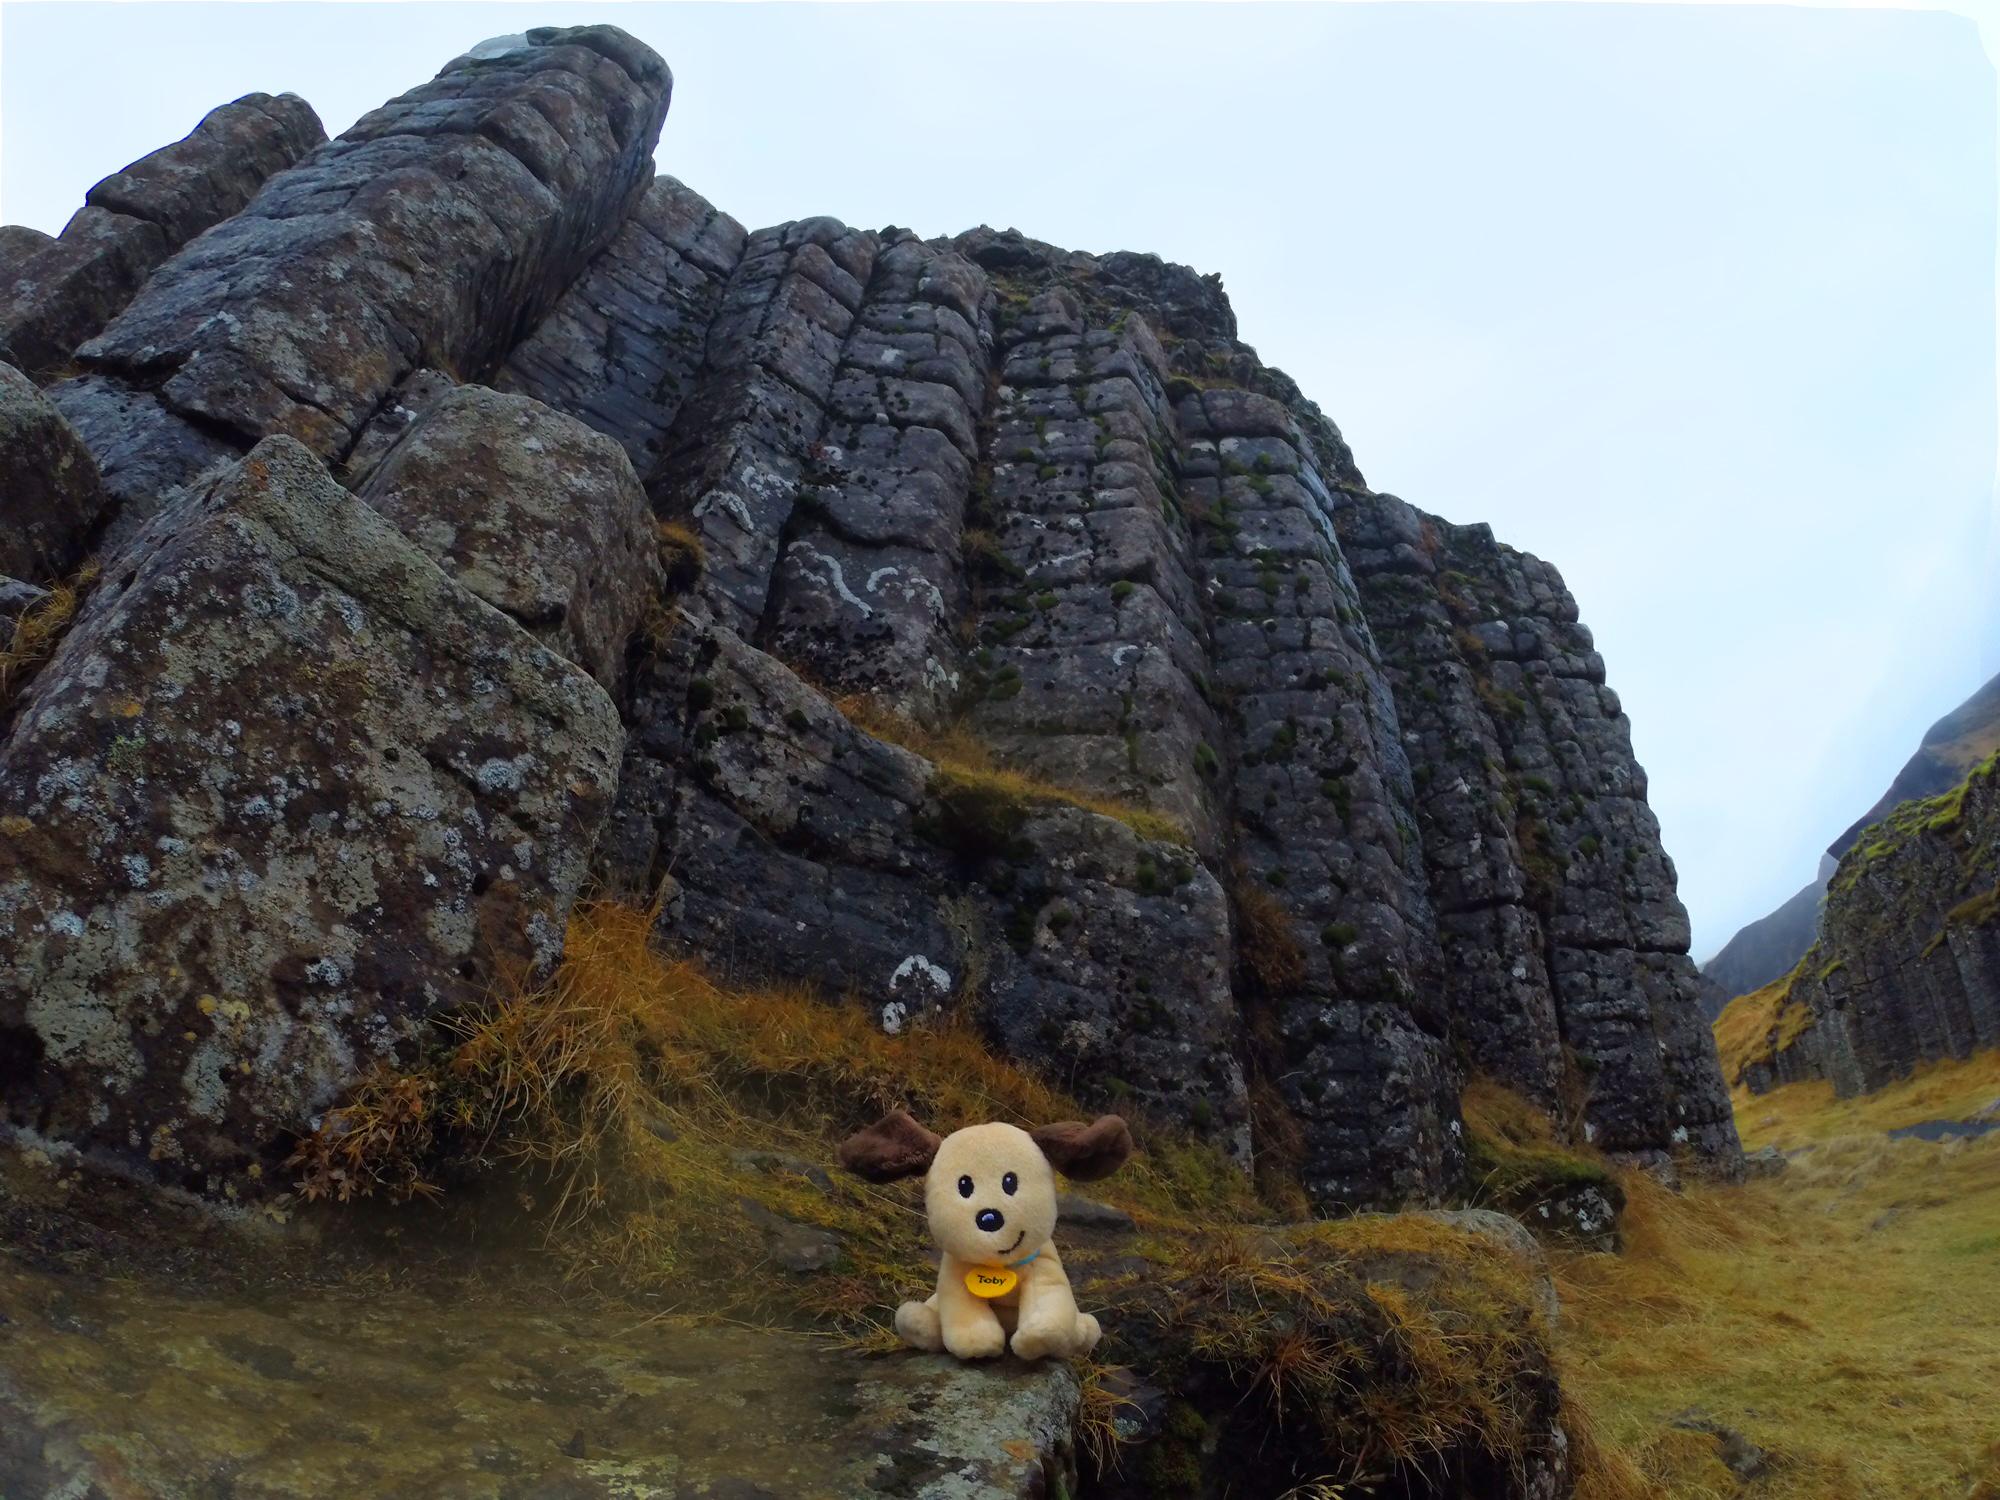 Toby Dverghamrar Dwarf Rocks